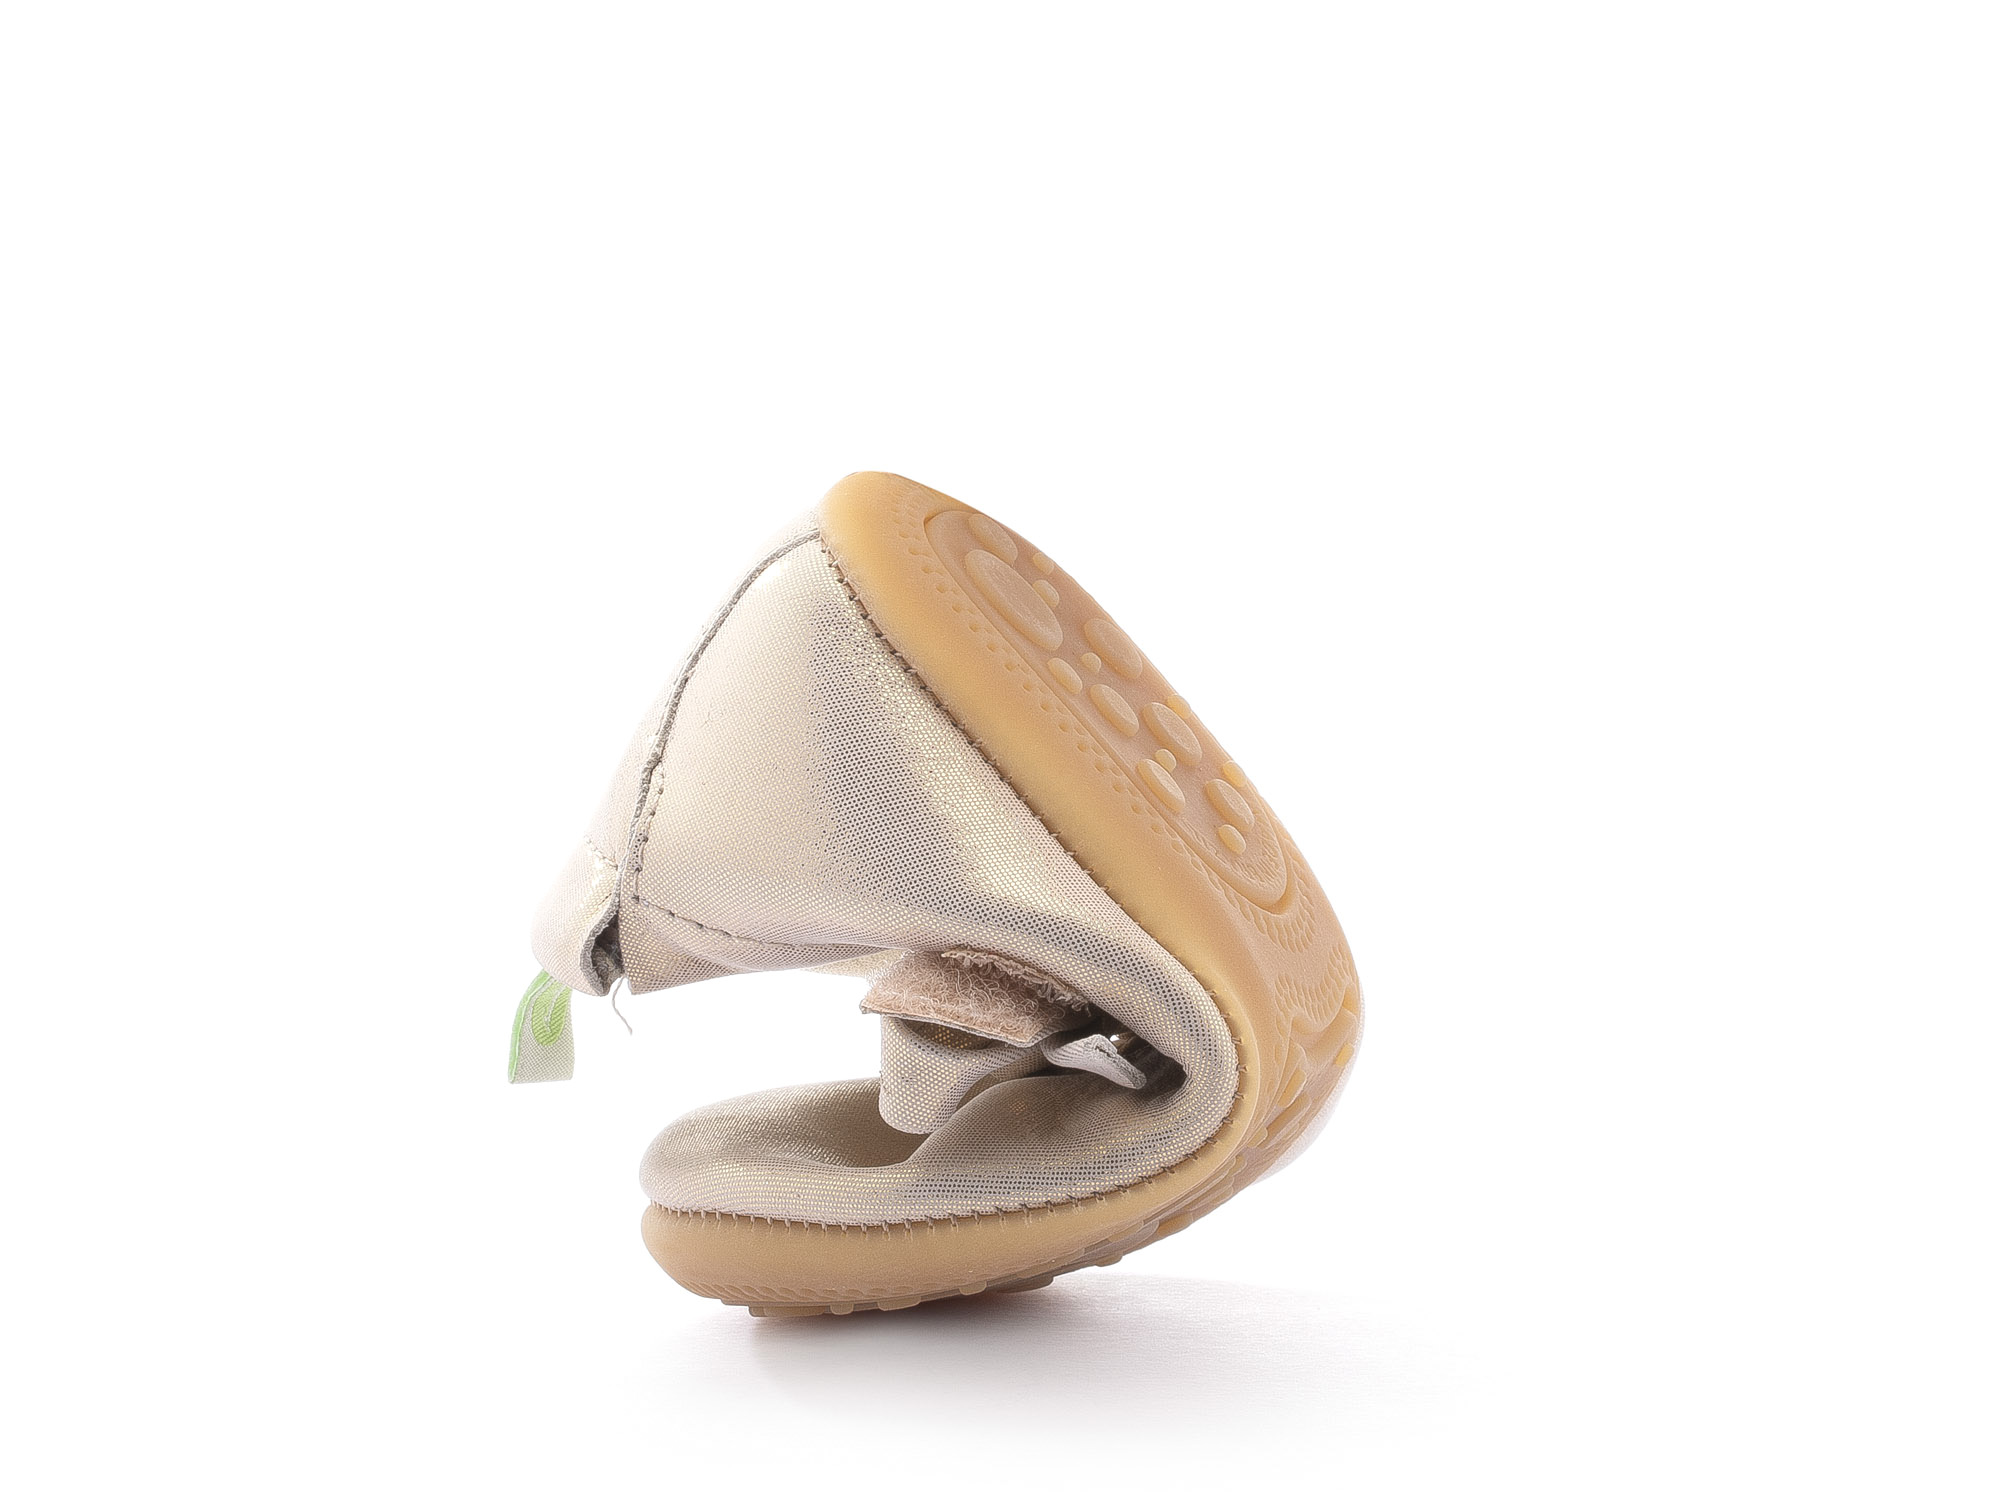 Boneca Dorothy Cotton Candy Foil Baby 0 à 2 anos - 2